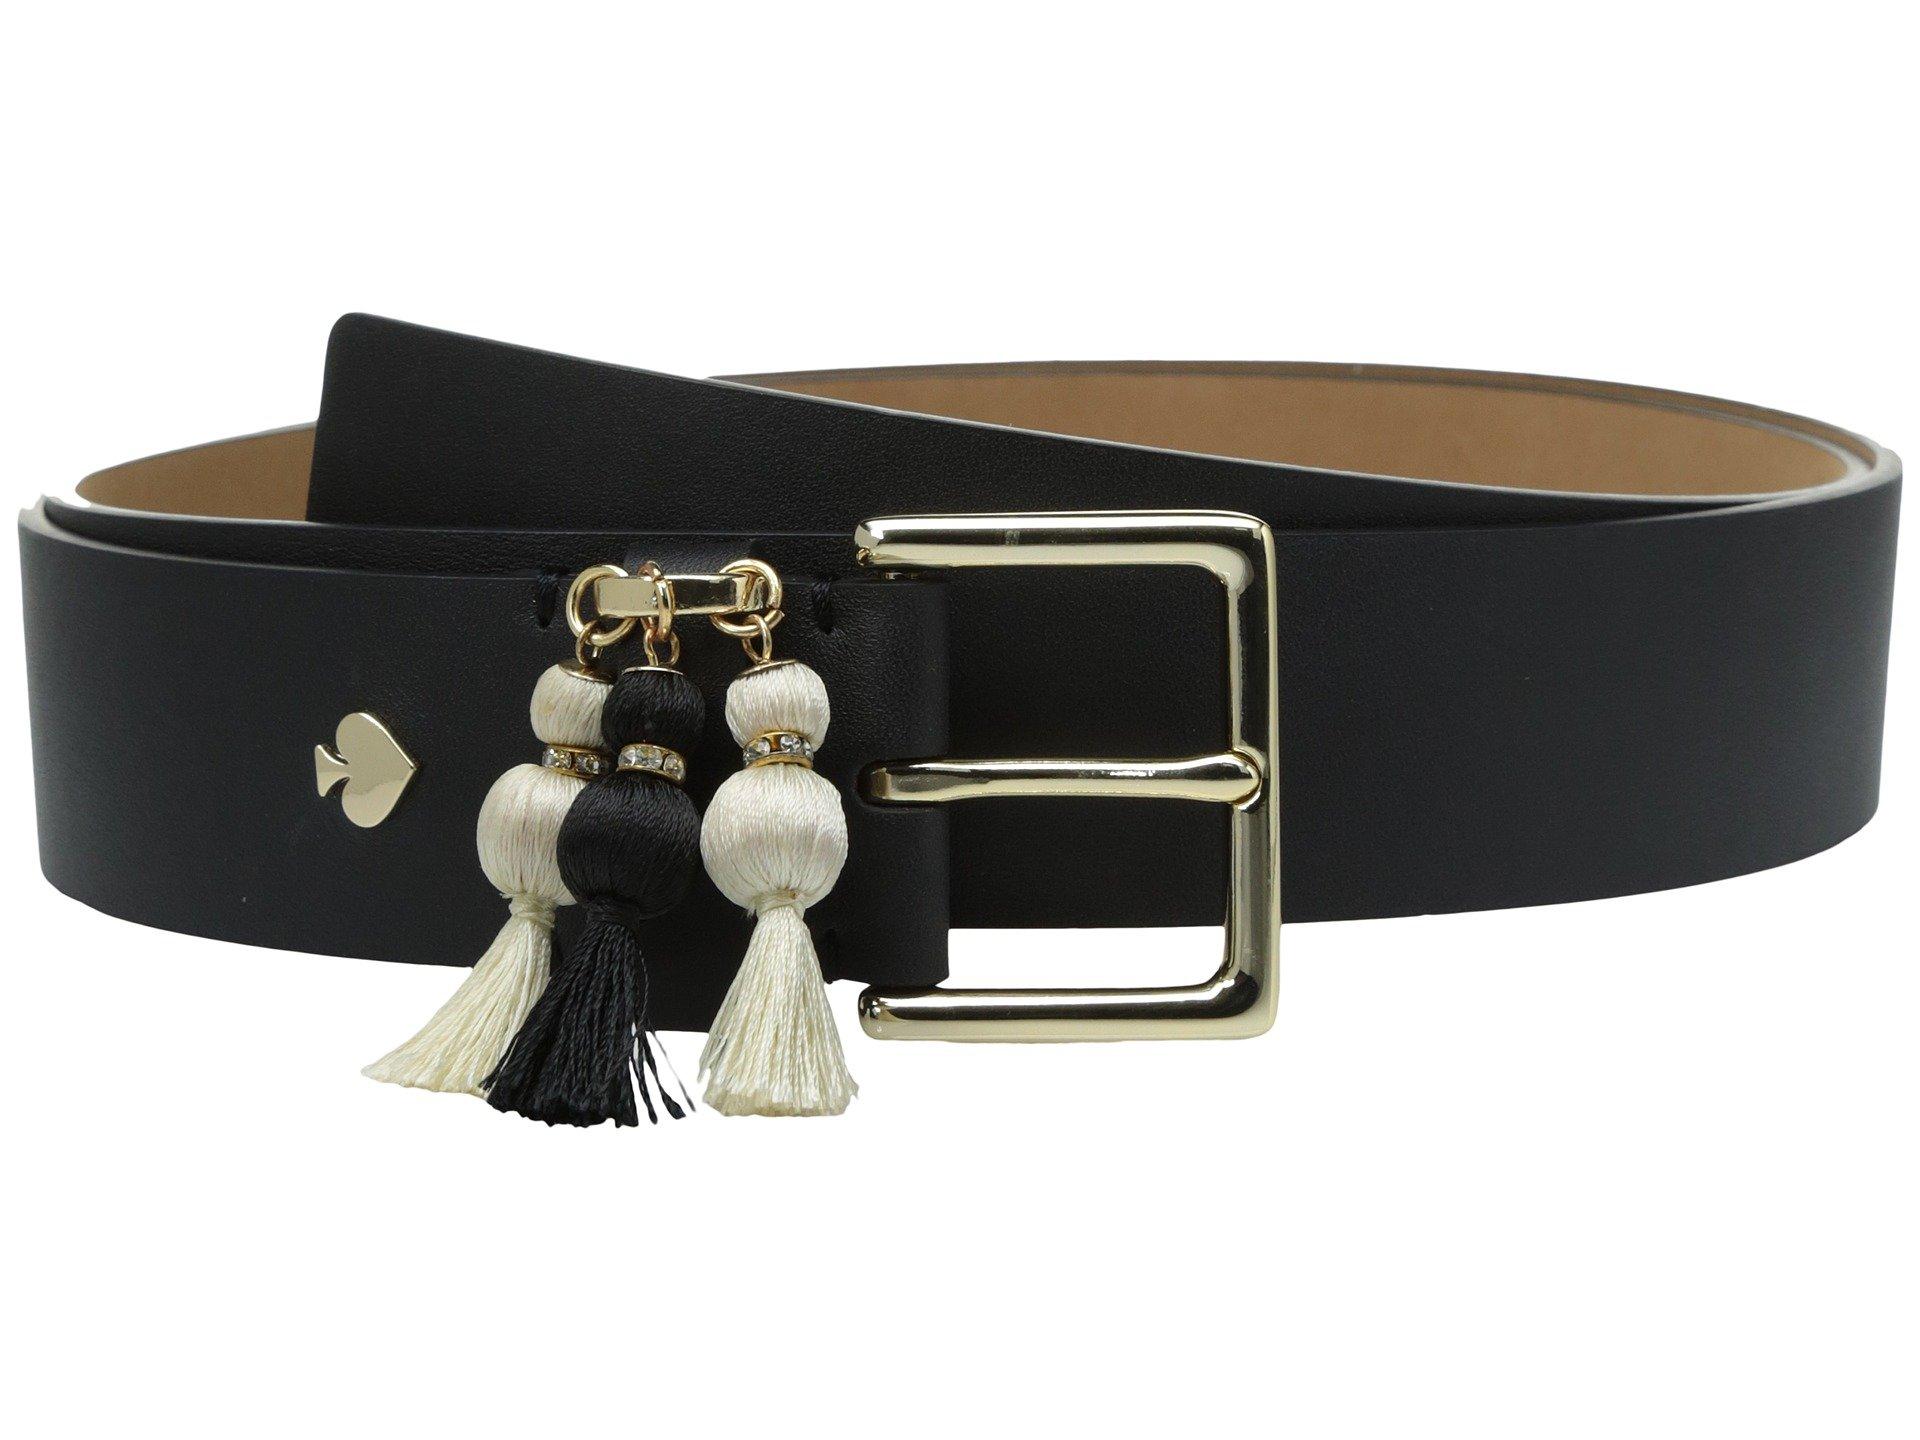 "Correa o Cinturon para Mujer Kate Spade New York 1 1/2"" Calf Belt w/ Triple Tassel  + Kate Spade New York en VeoyCompro.net"